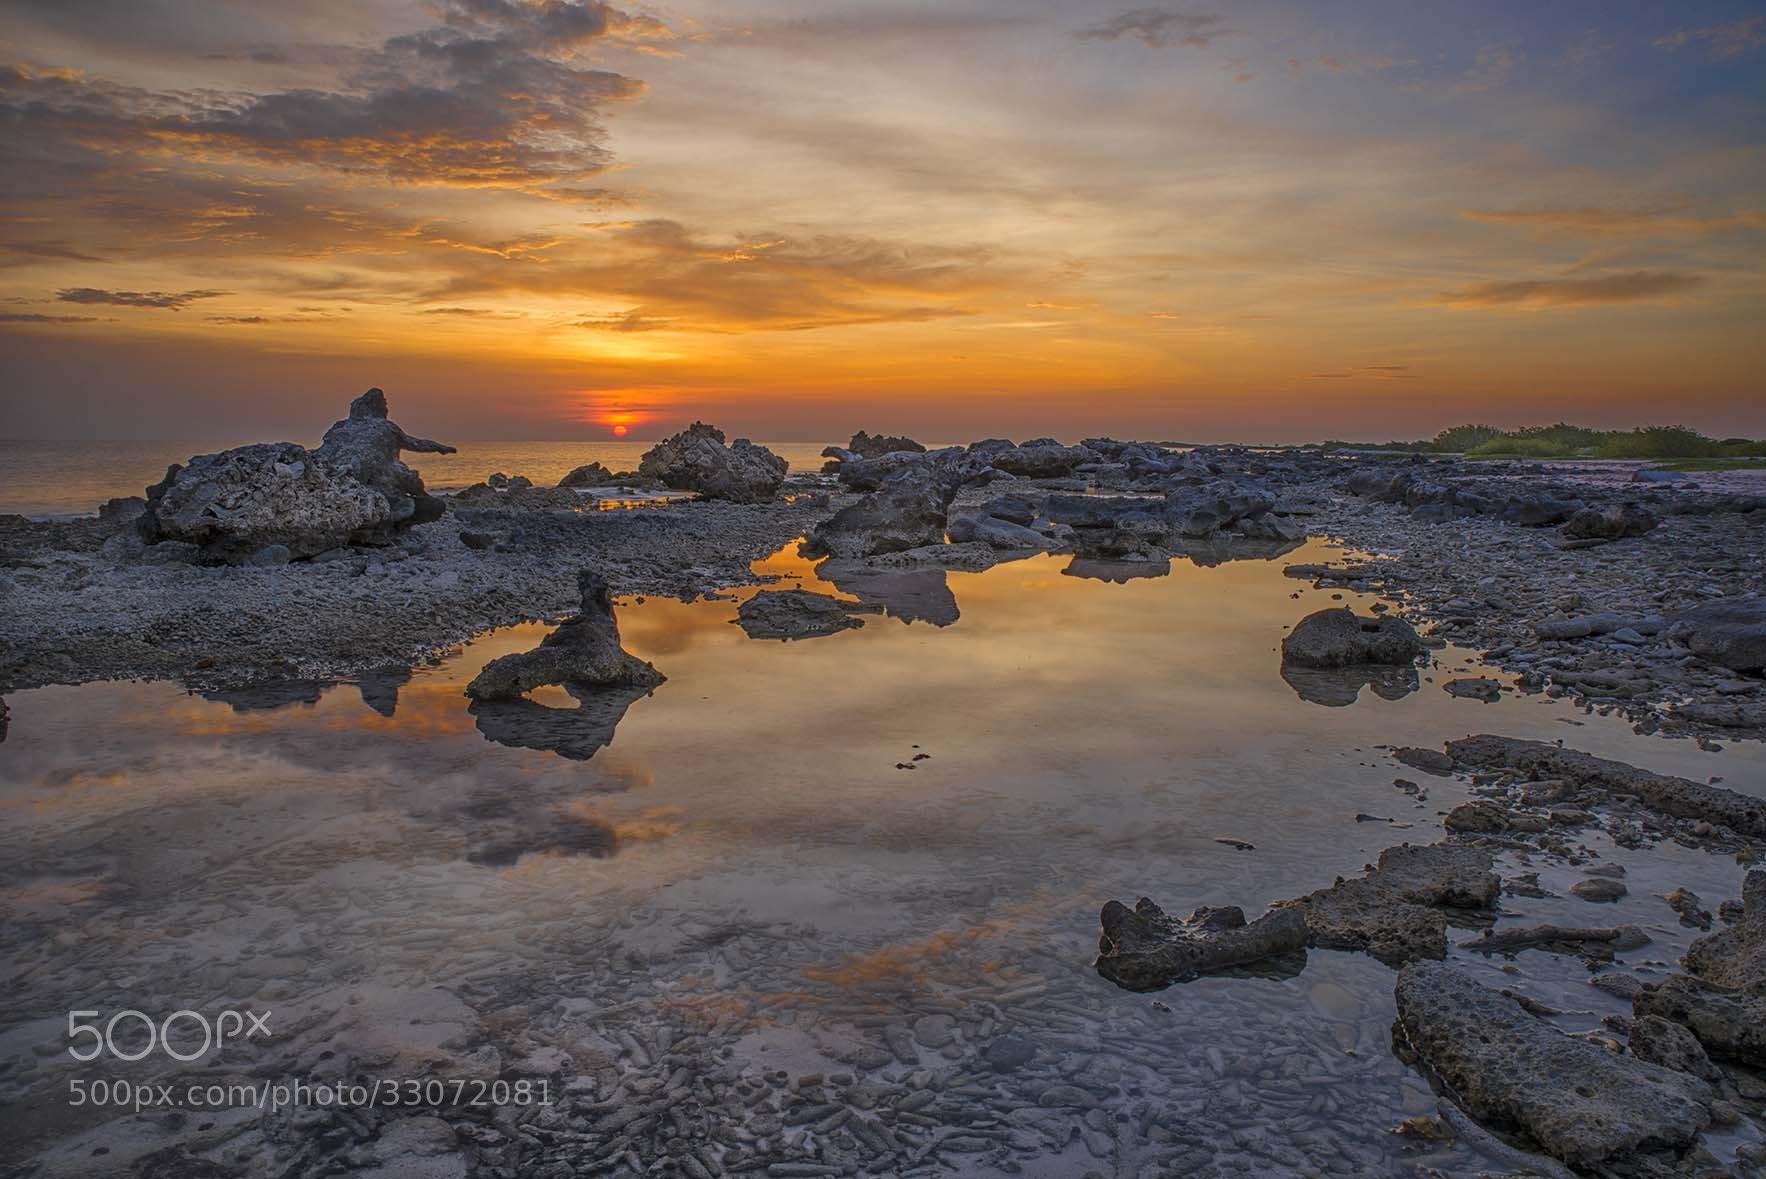 Photograph Barryl's reef by Lorenzo Mittiga on 500px